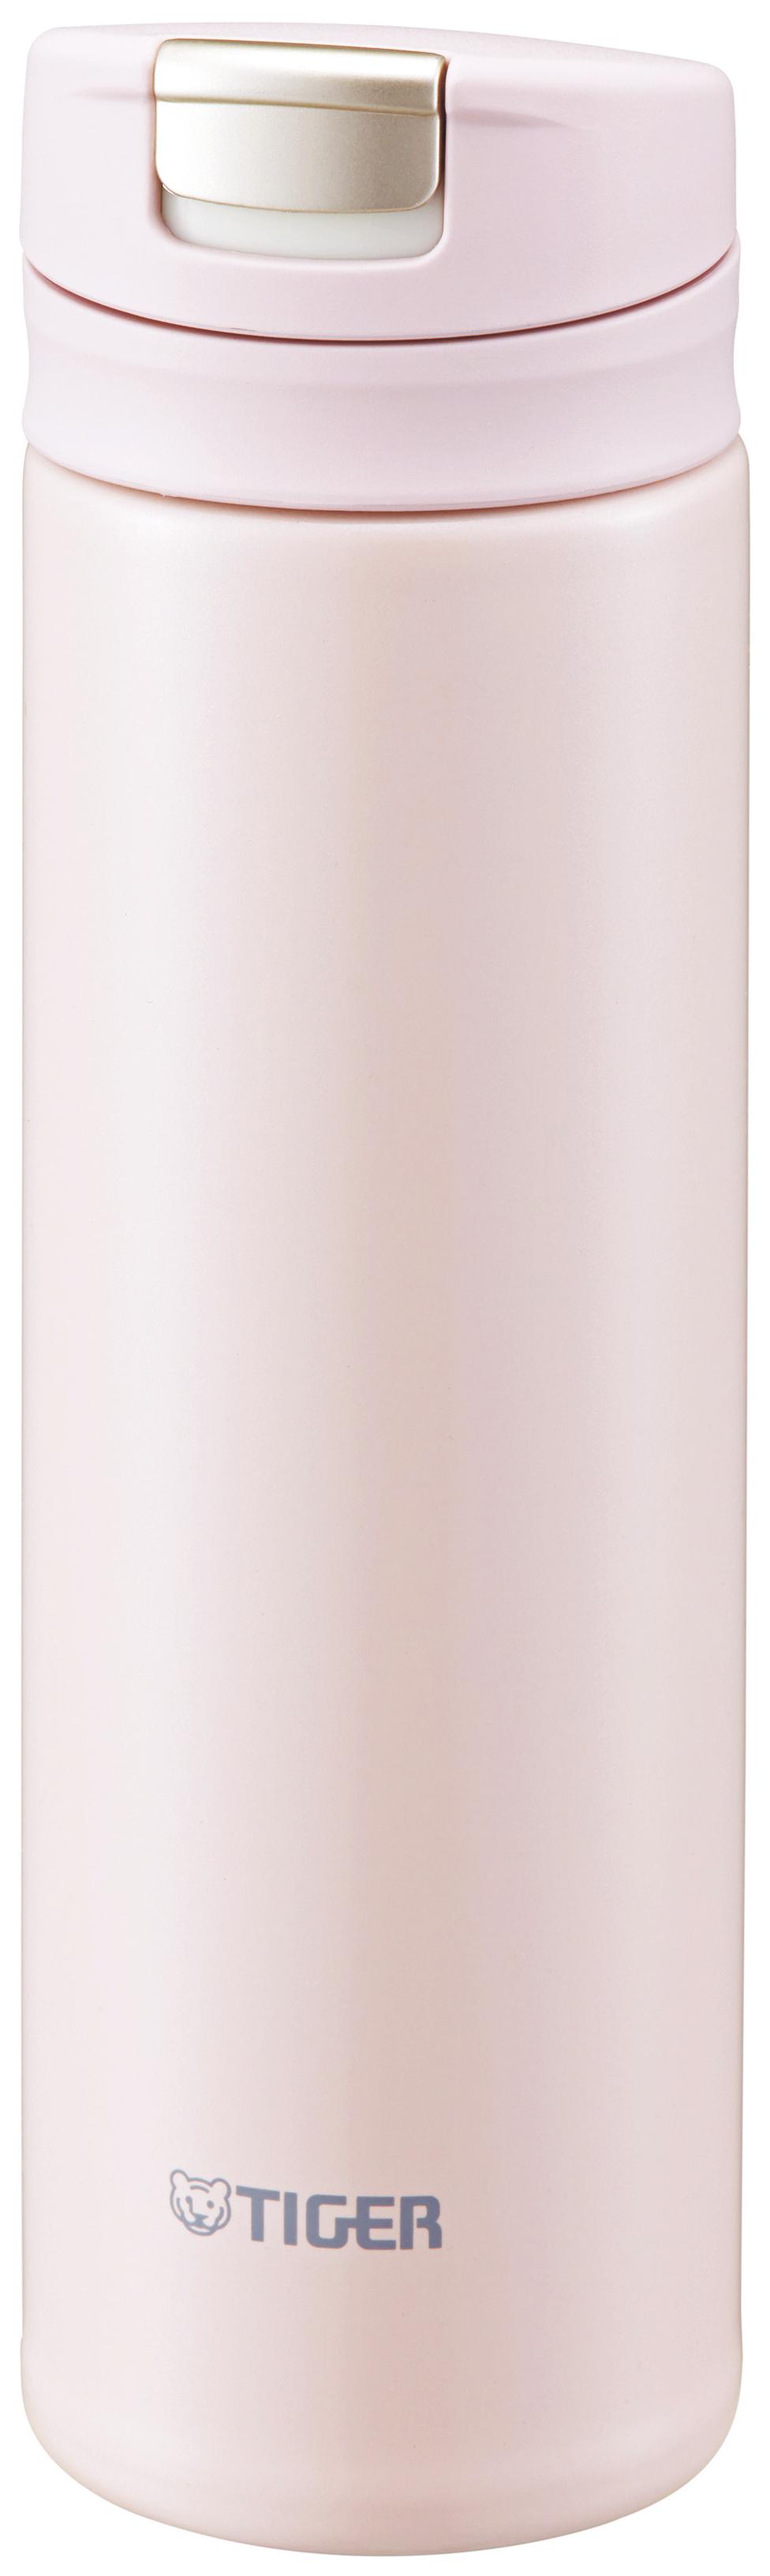 Термокружка Tiger, MMX-A030 PP, пудрово-розовый, 0,3 л